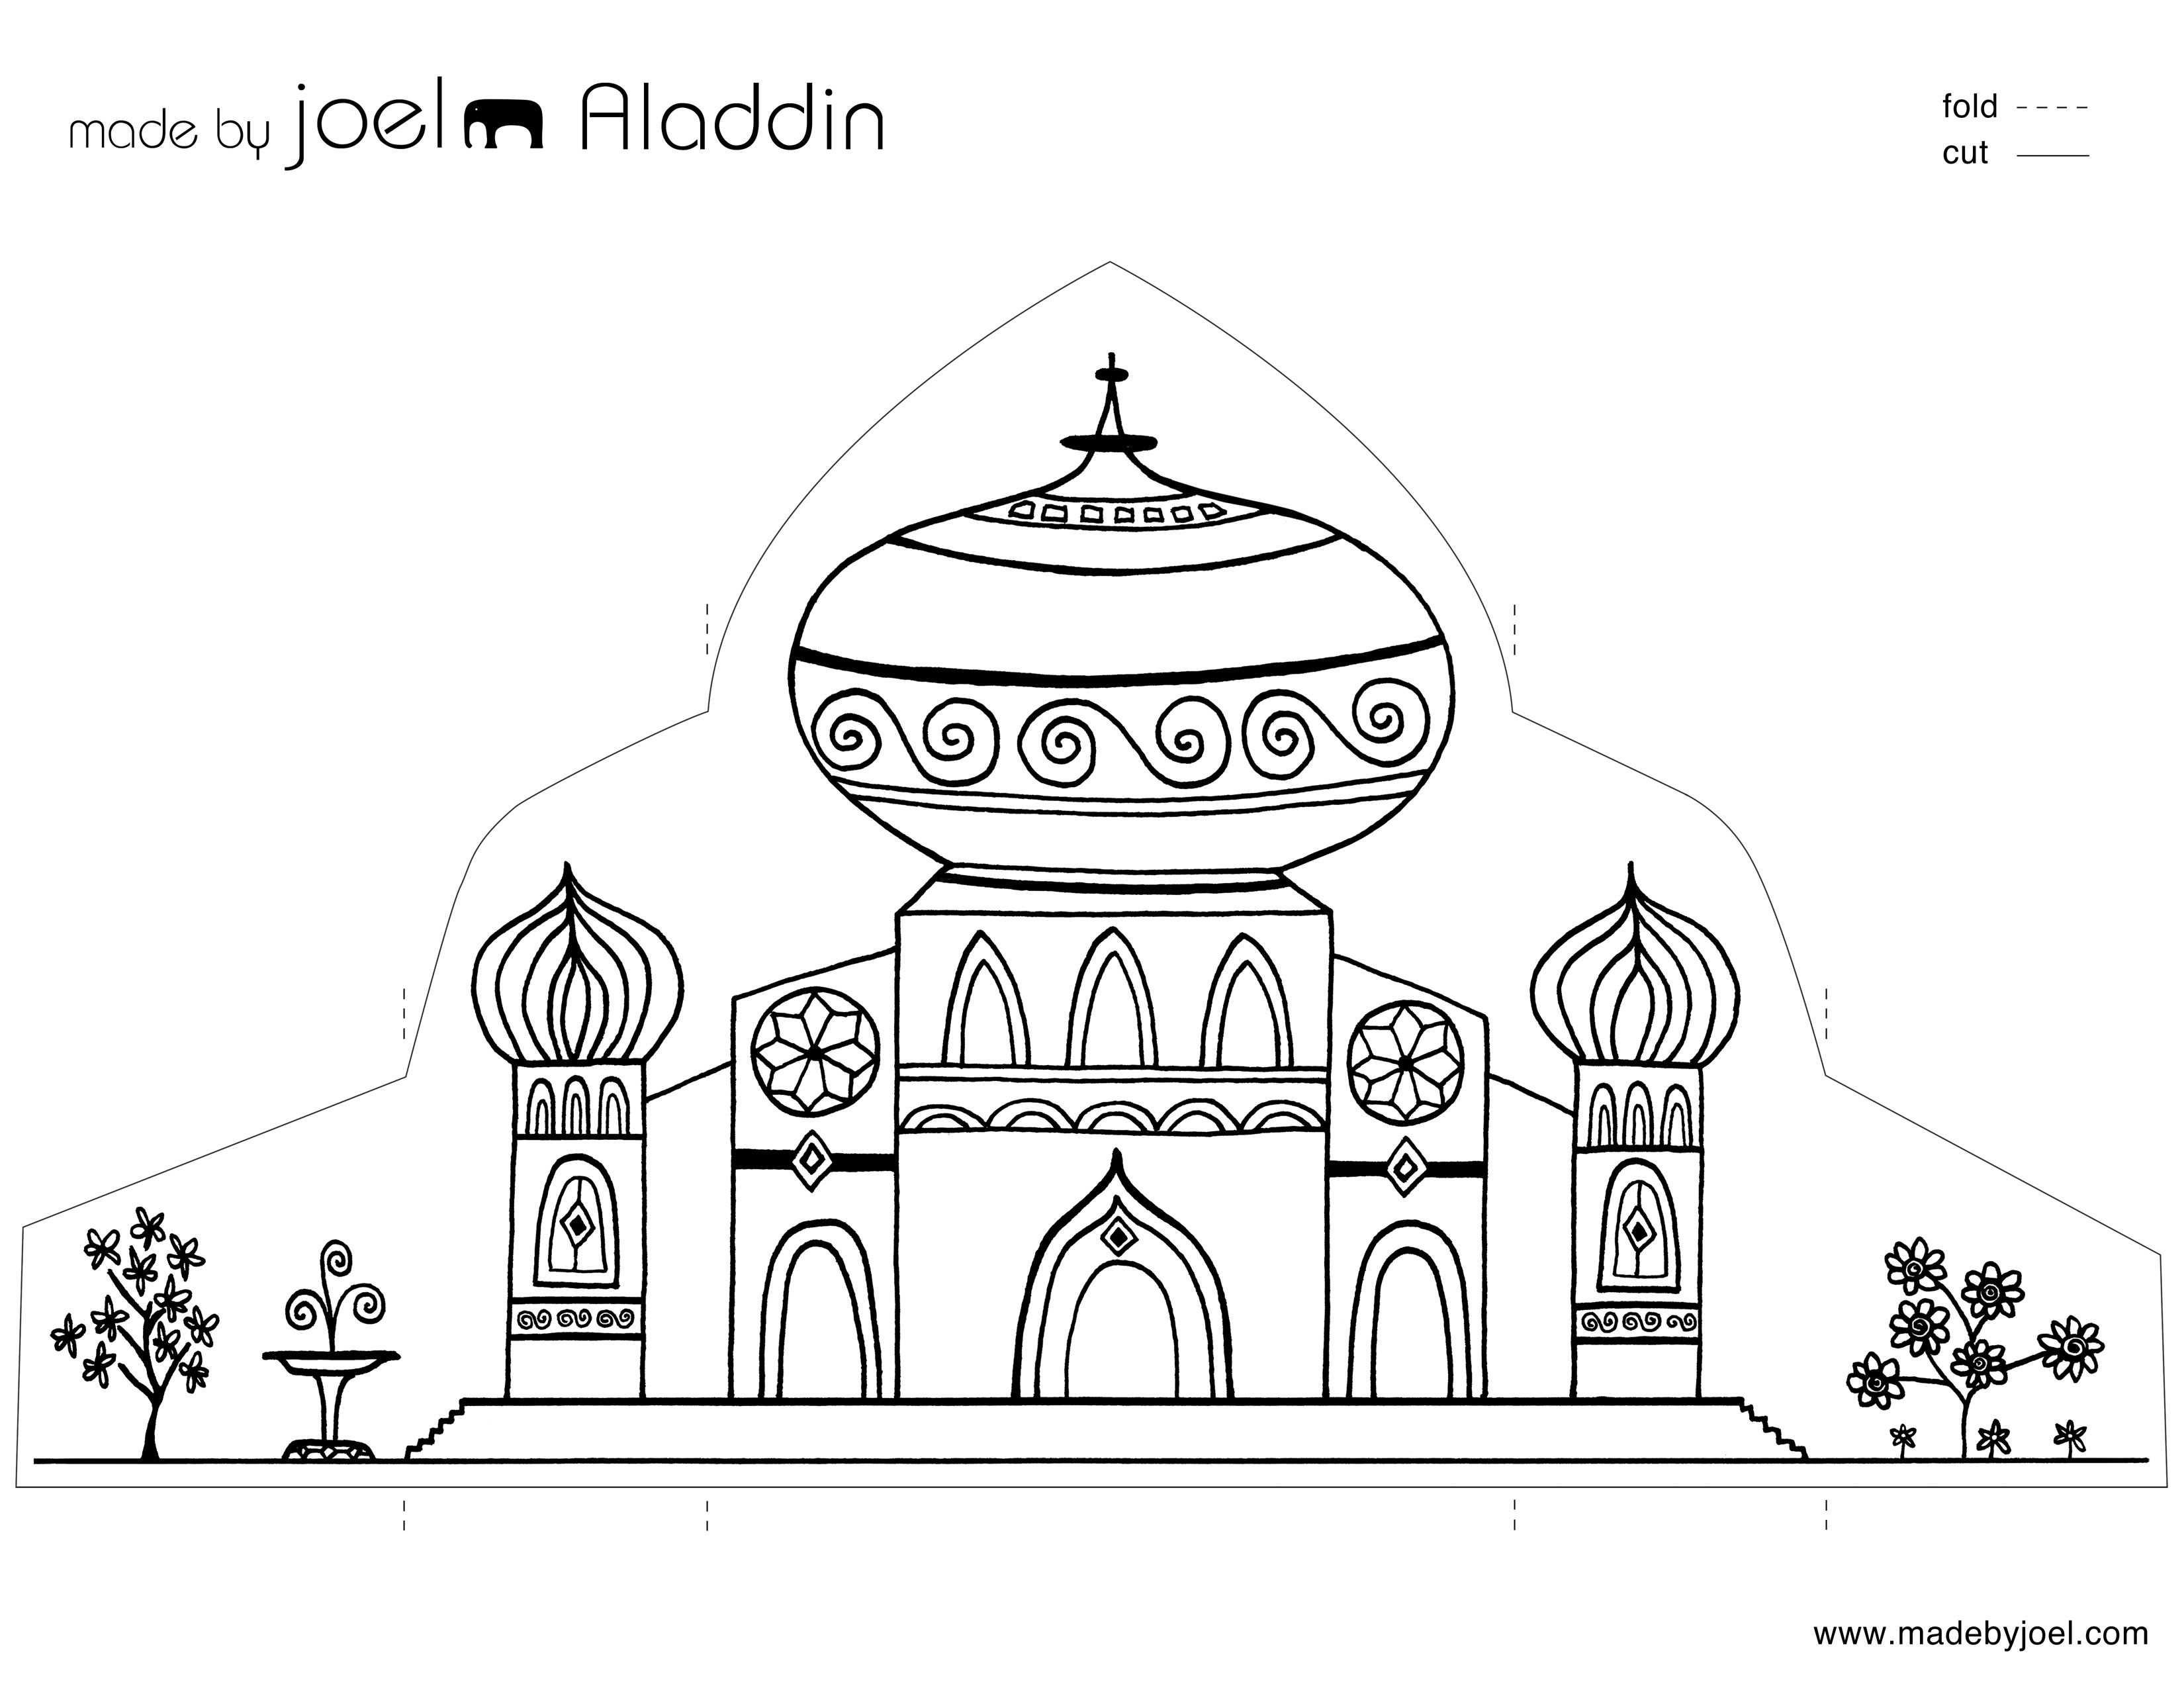 Made By Joel Aladdin Paper City Craft Project Knutselen